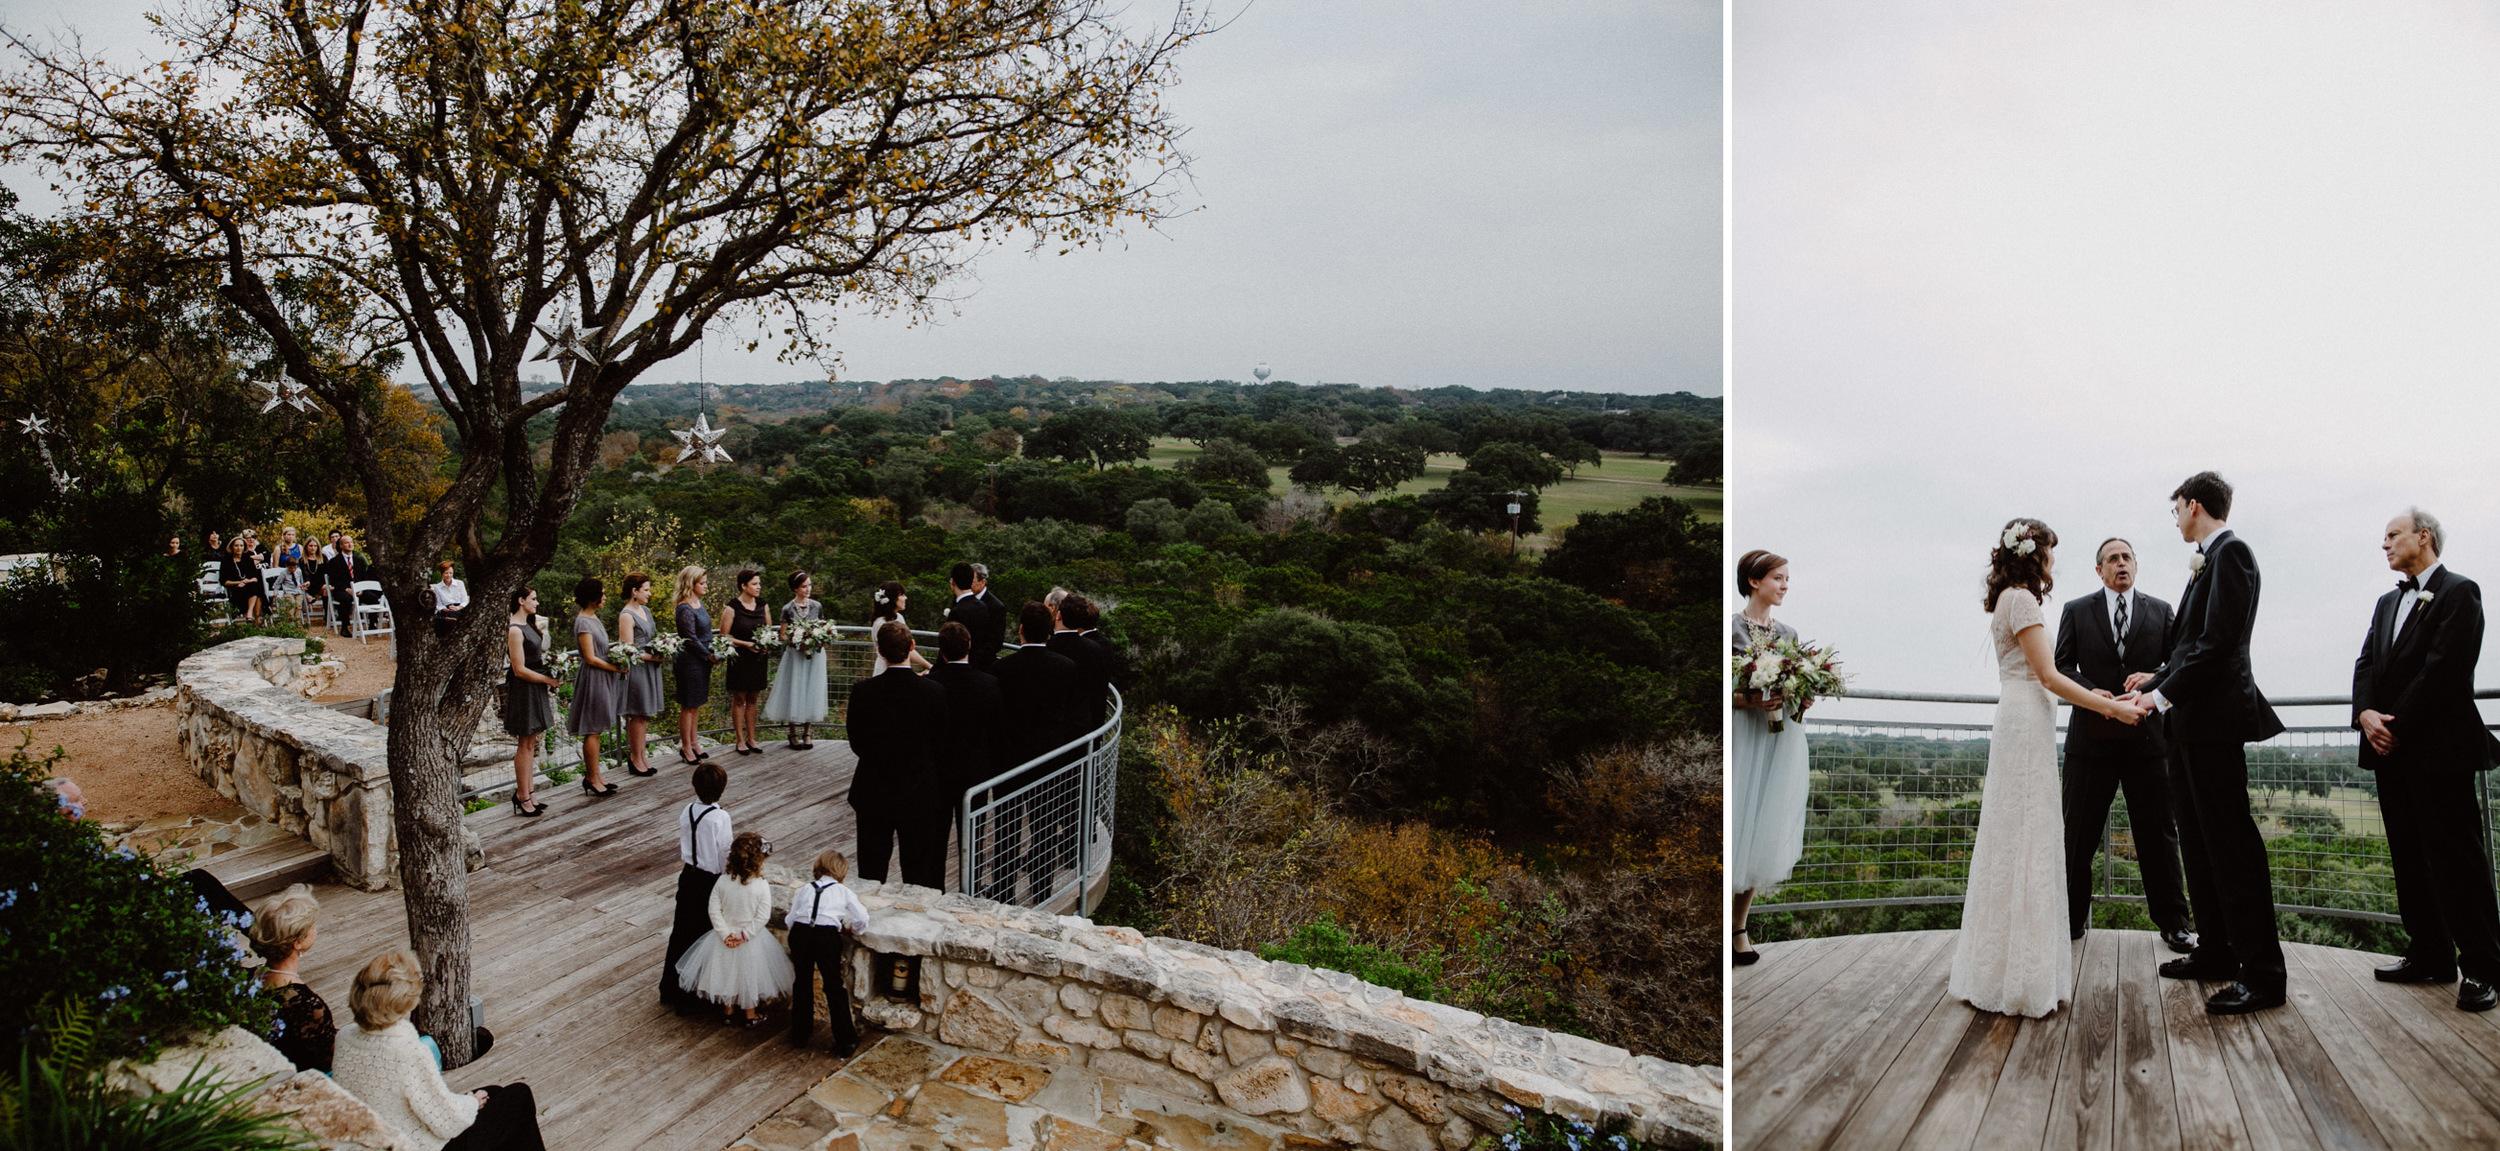 San Antonio Home Wedding 3